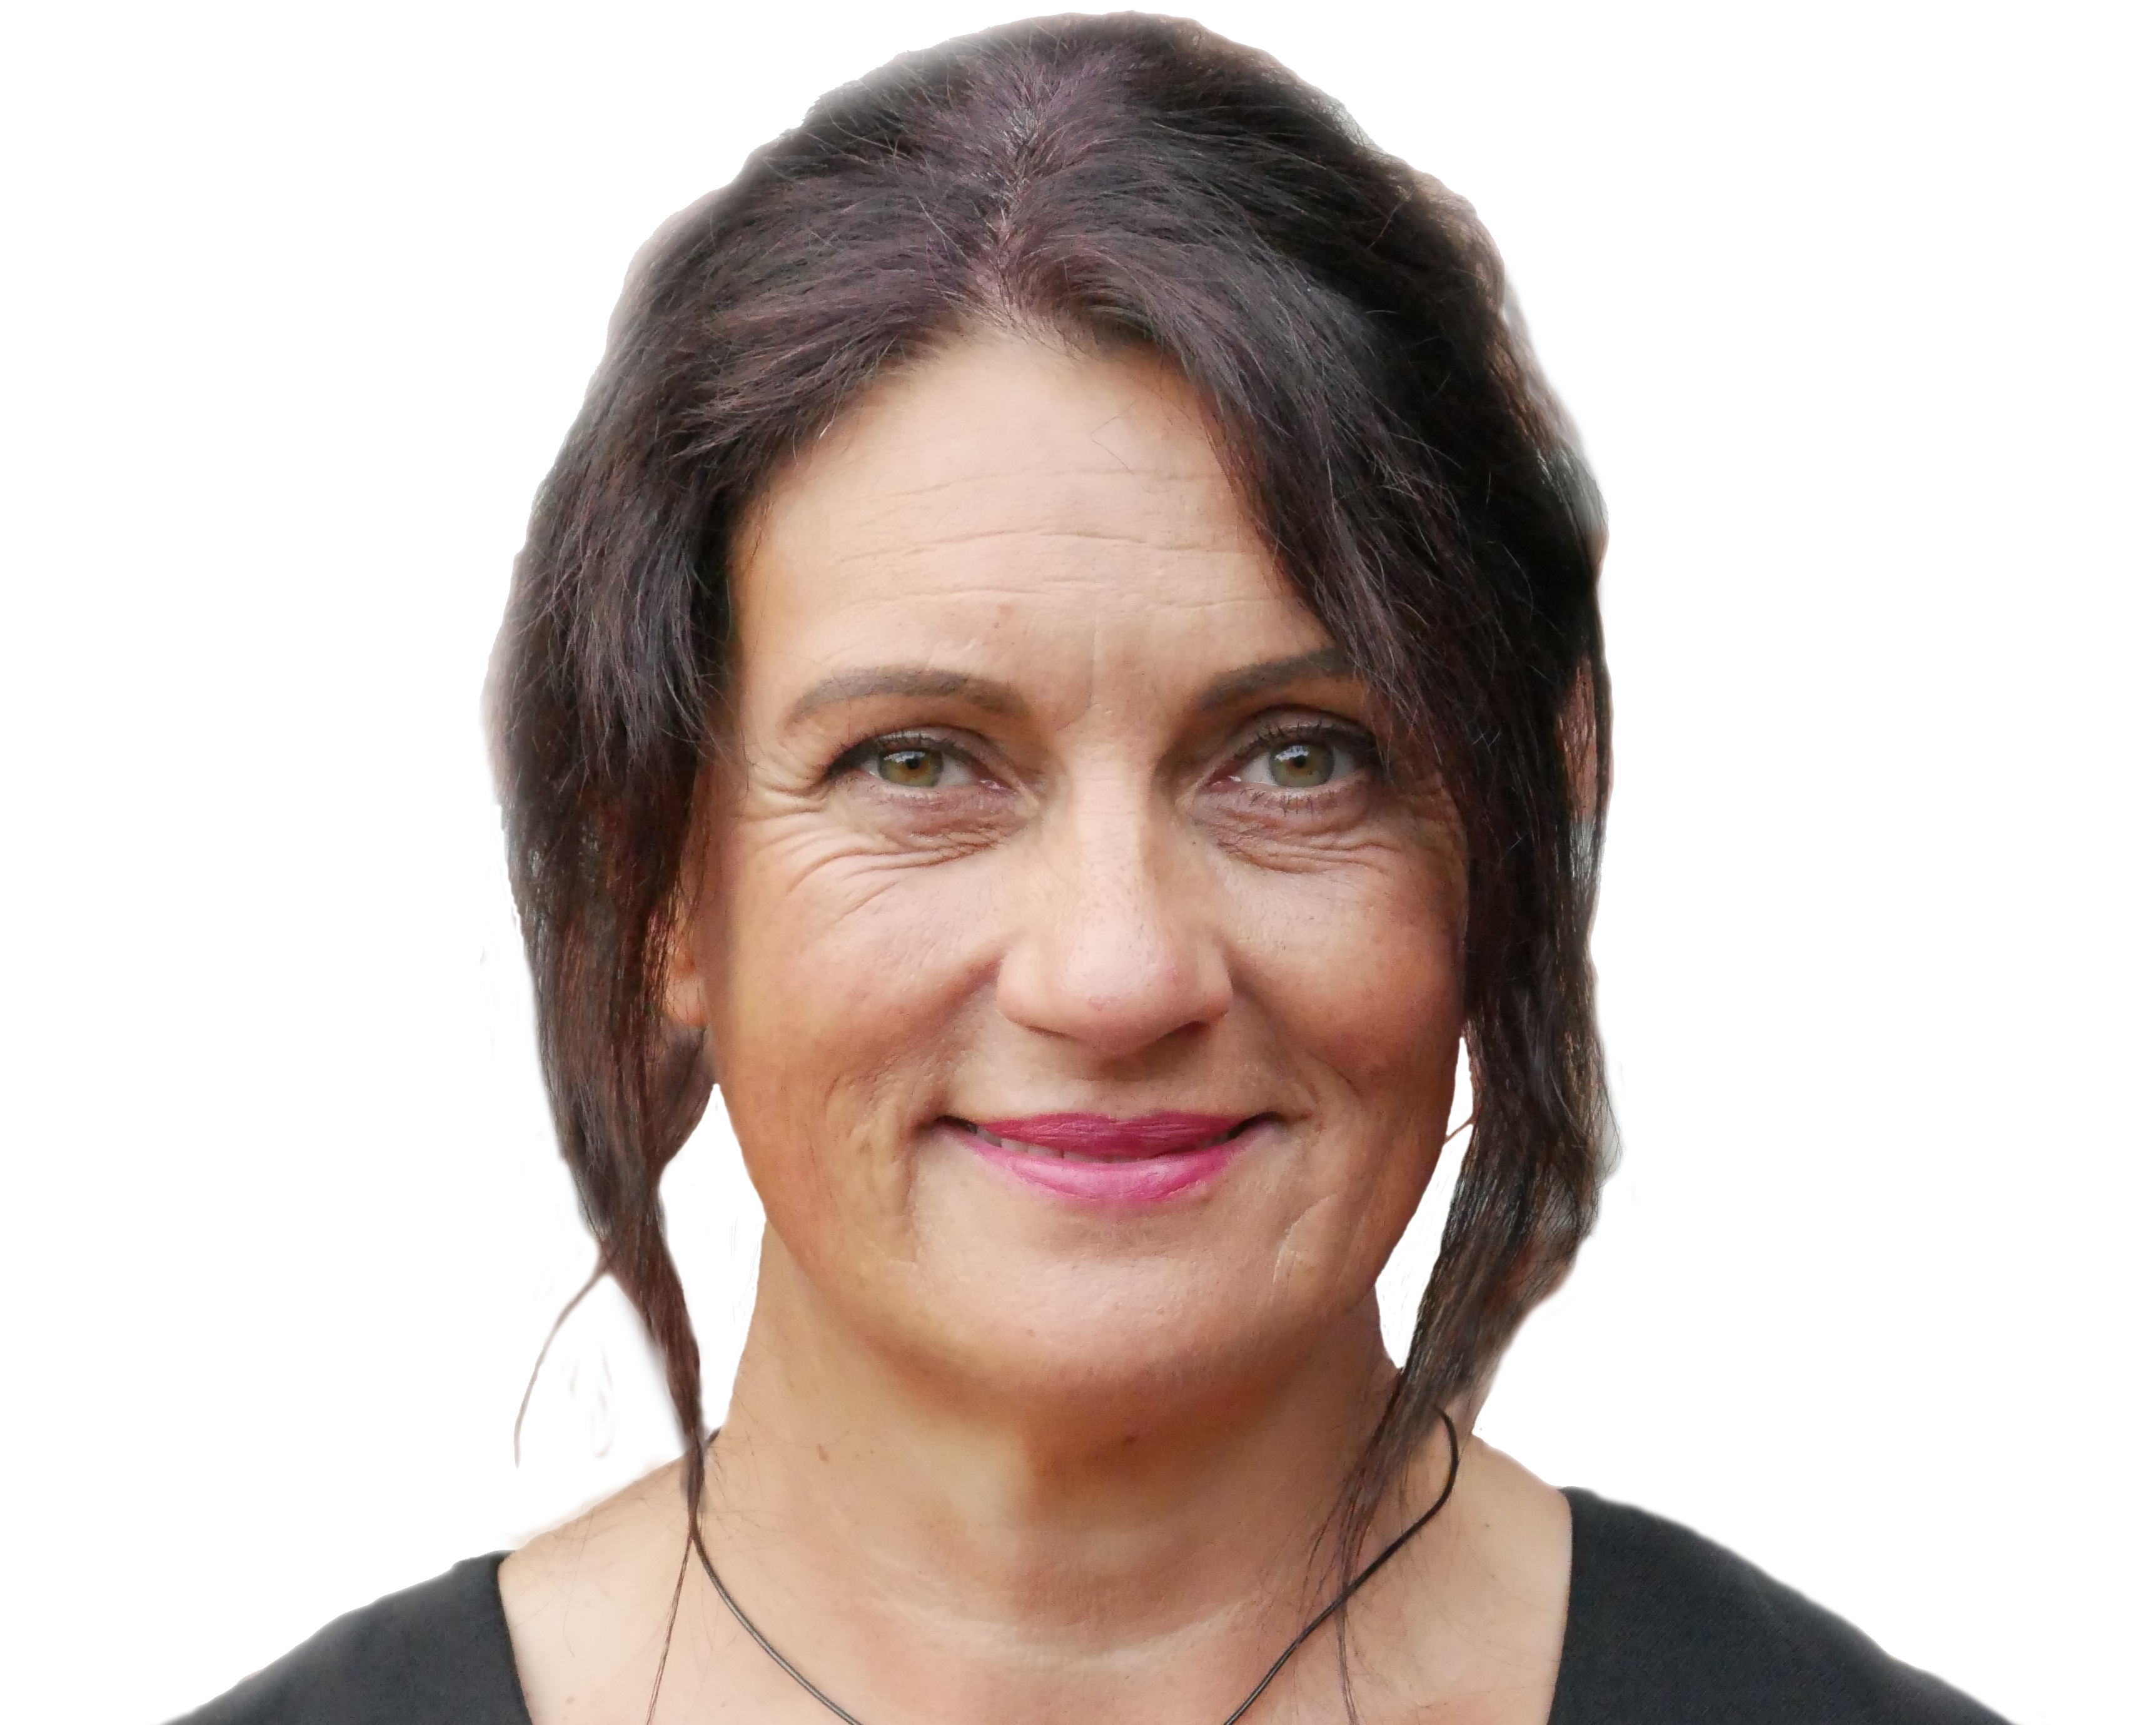 Nicole Sroka Bundesverband Neurofibromatose Marketing Kommunikation Coaching Beratung Zeitschrift NFaktuell